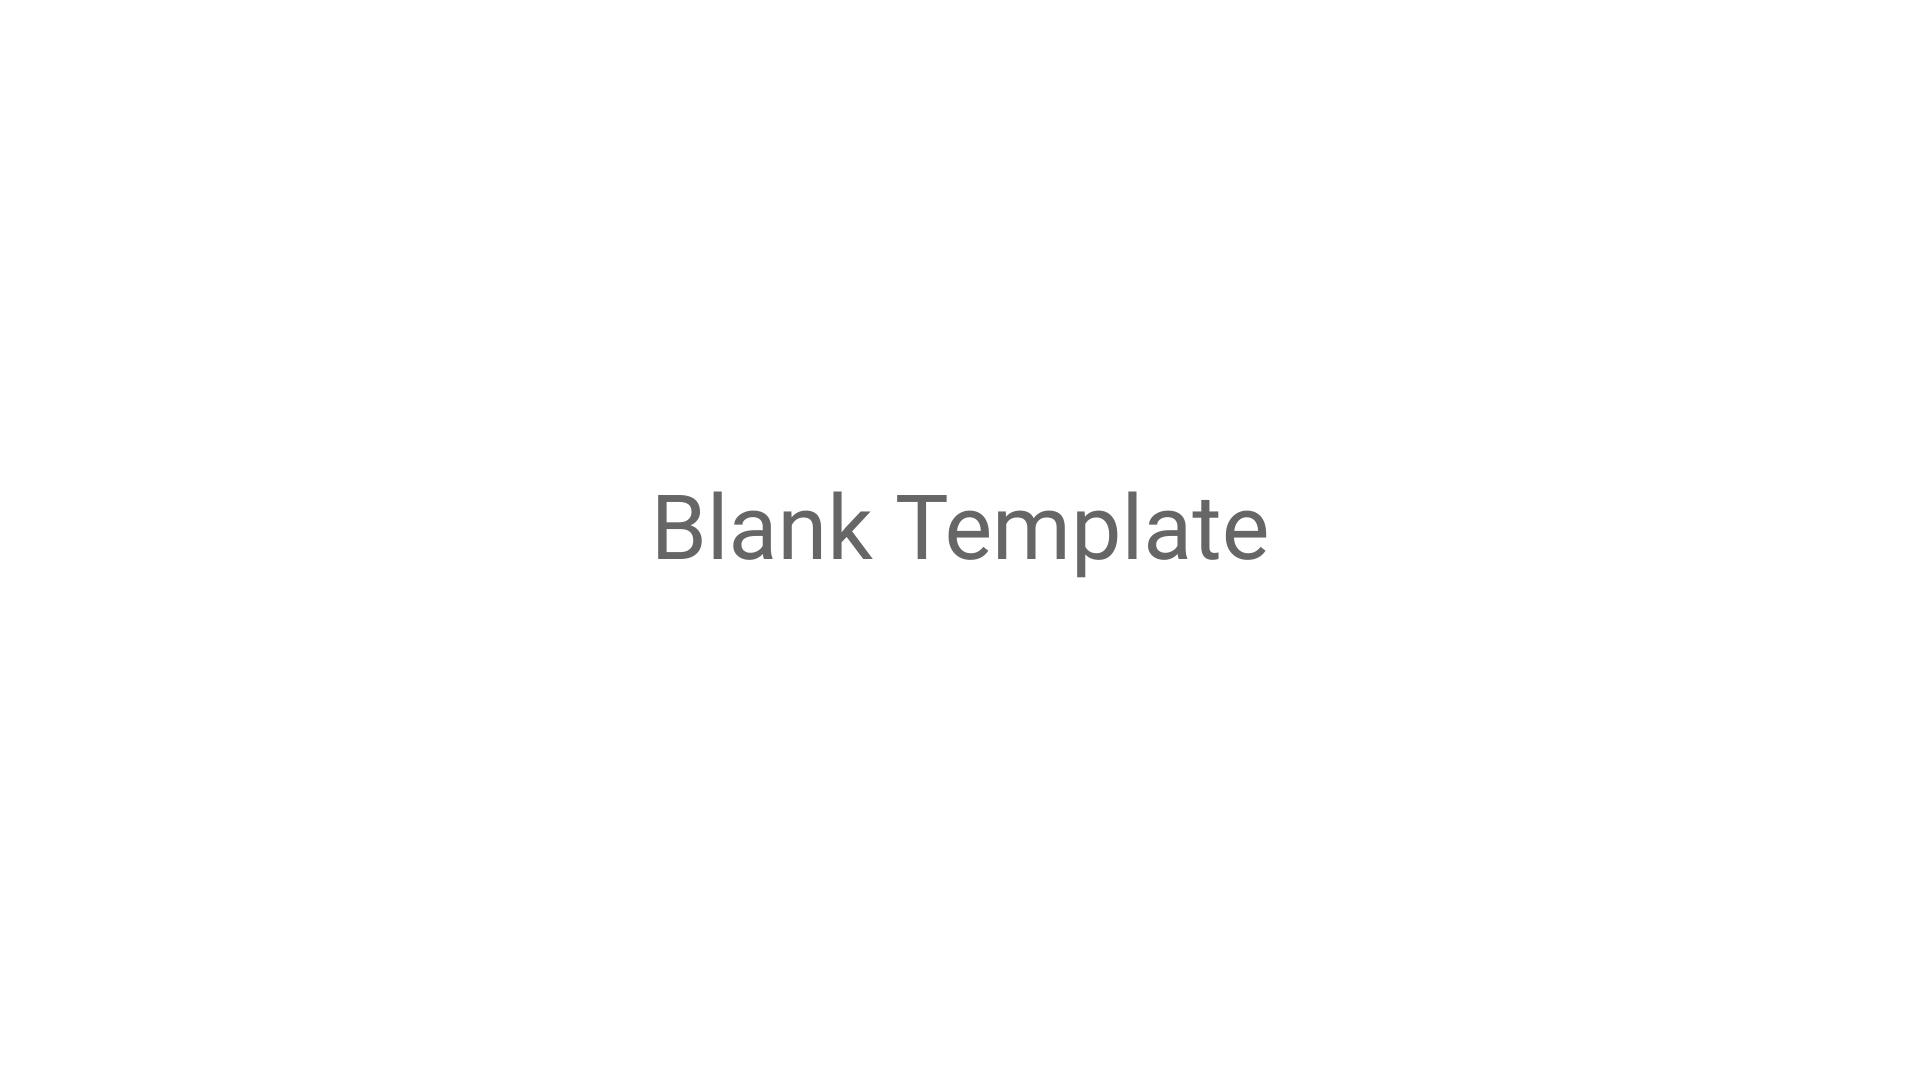 Blank Template Mockups Template